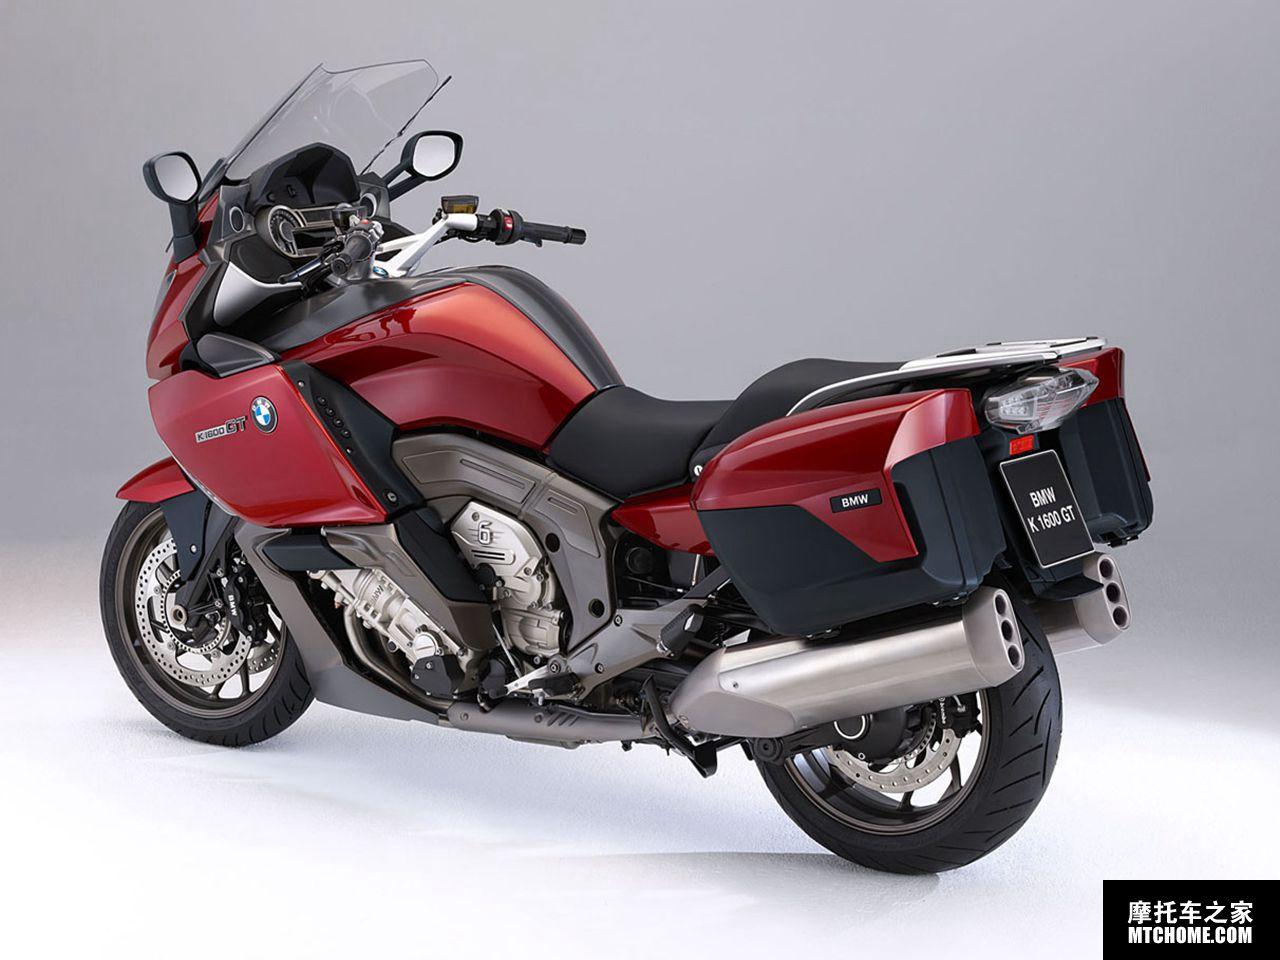 R Nine T >> 【宝马BMW K1600GT整车图片】_摩托车图片库_摩托车之家